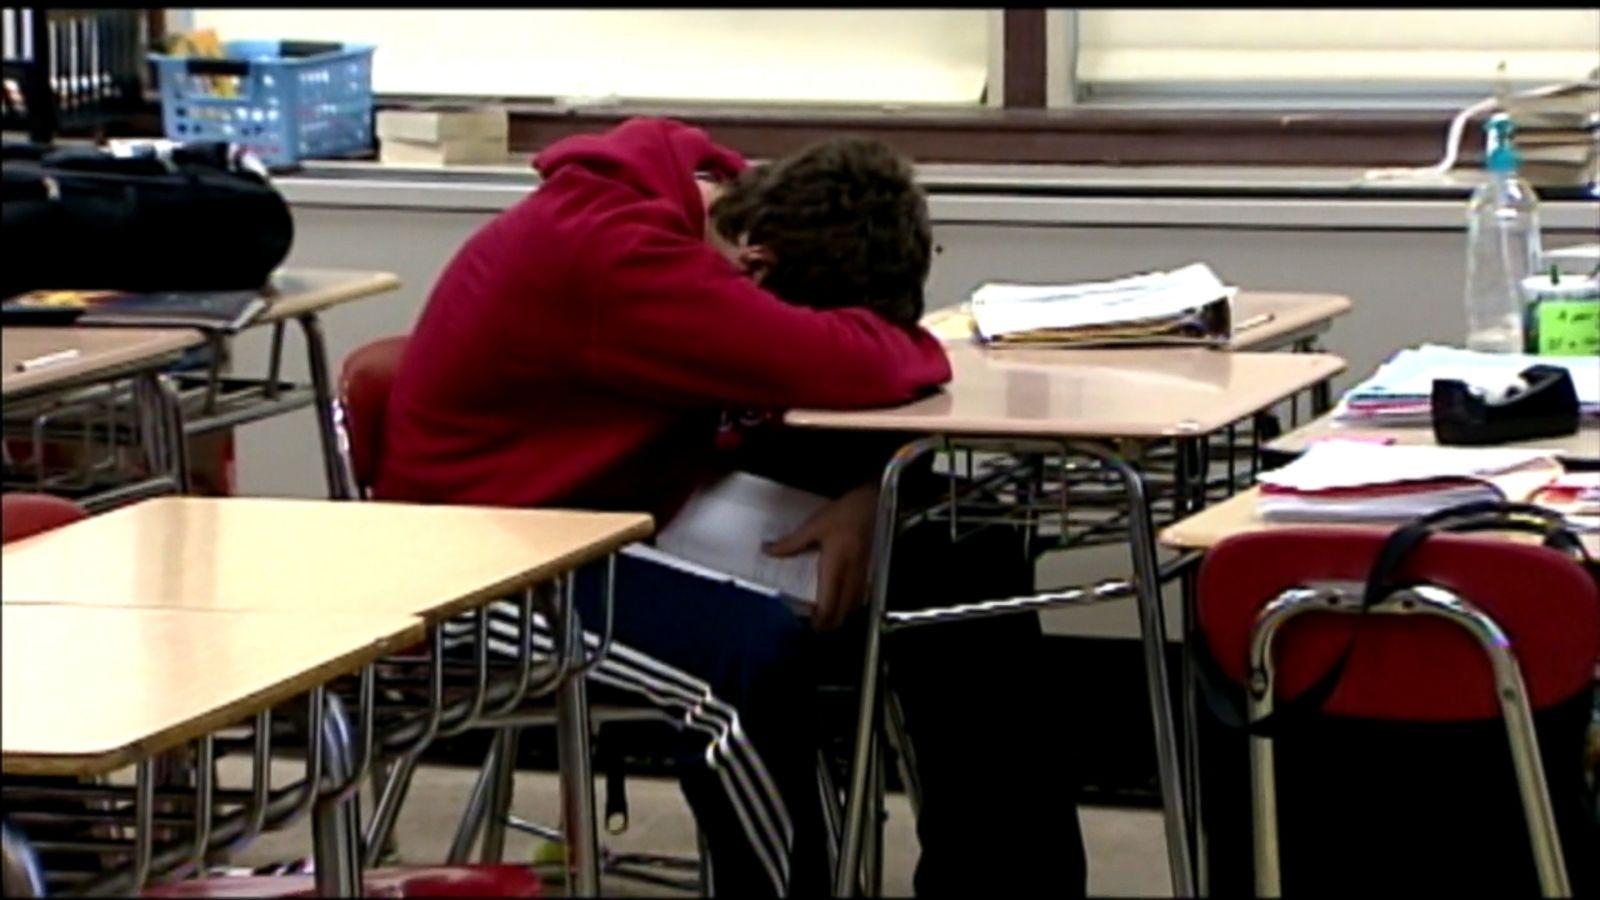 Later school start times help teens' moods, study says - ABC News